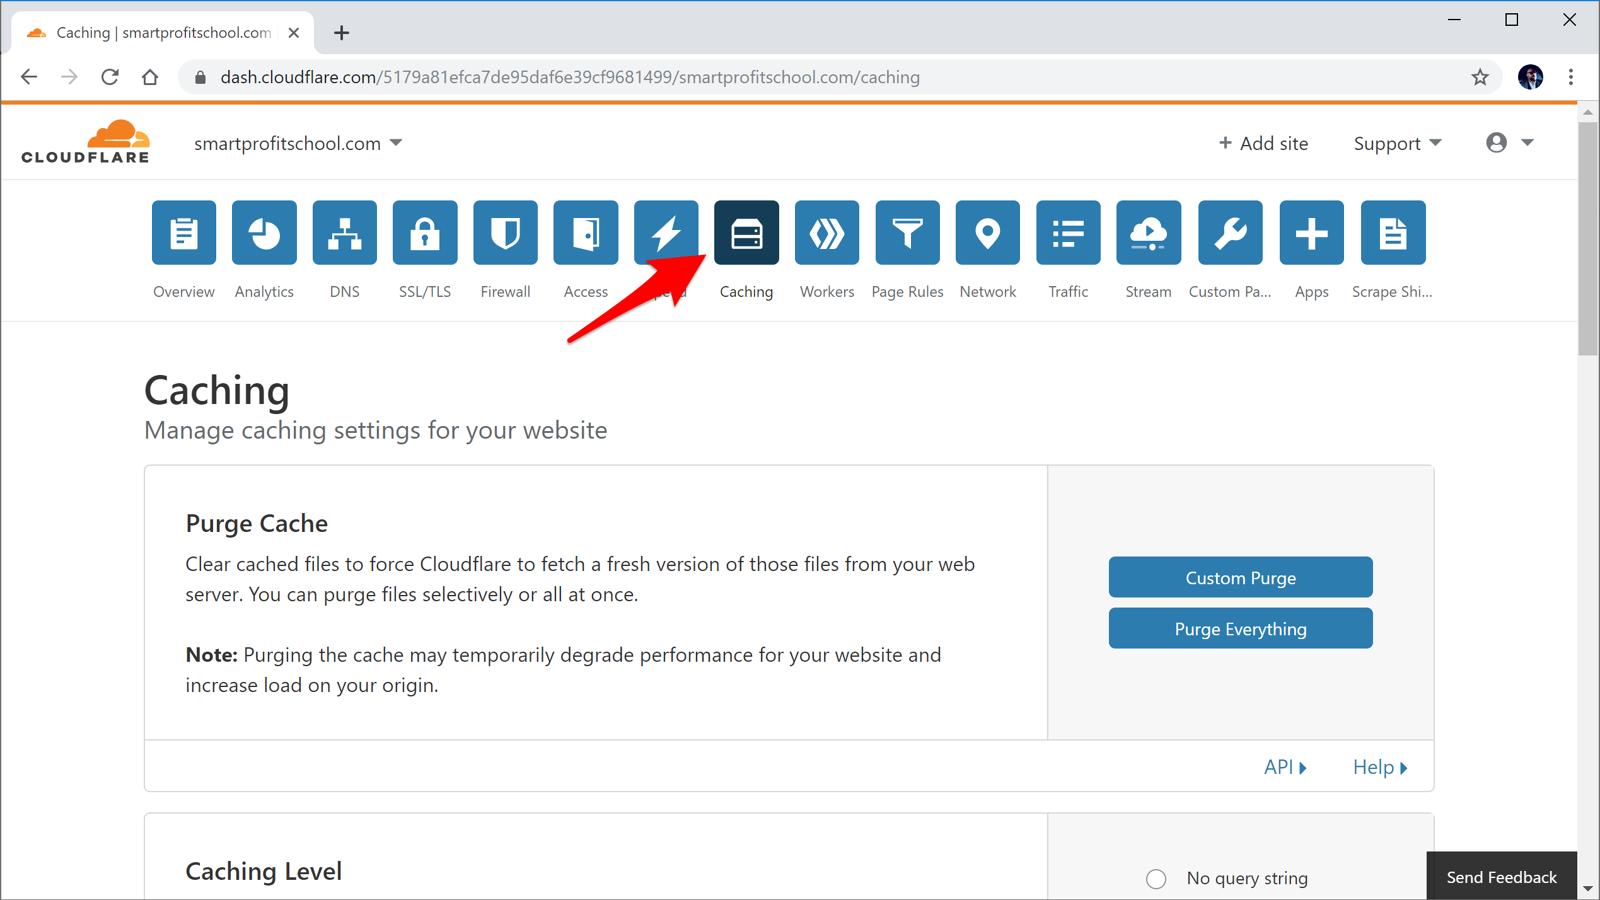 Cloudflare purge cache